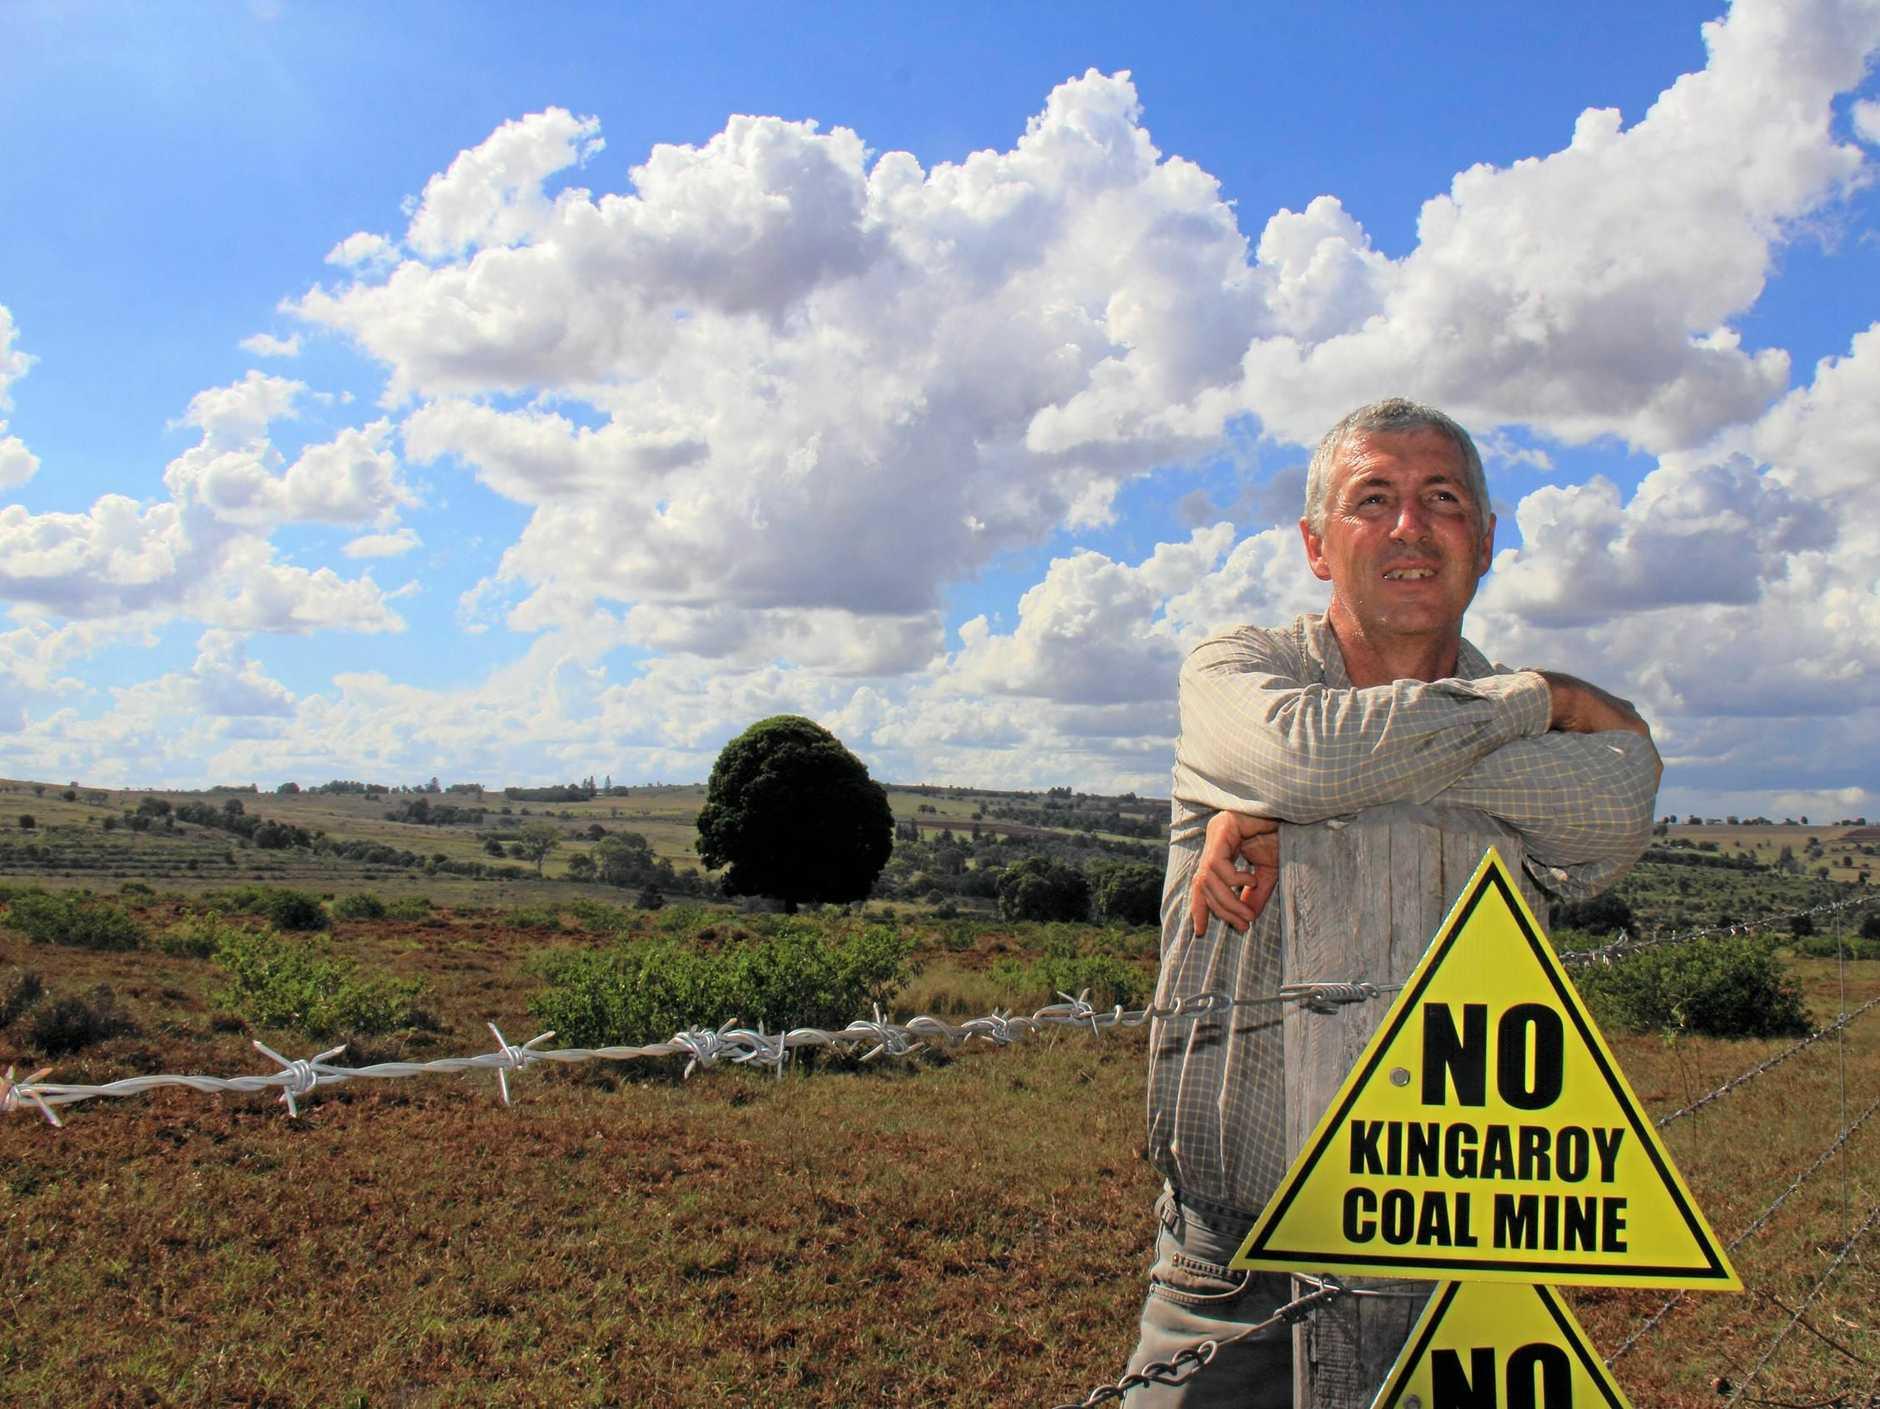 MINING ISSUES: Kingaroy Concerned Citizens Group spokesman John Dalton is hopeful for the future.